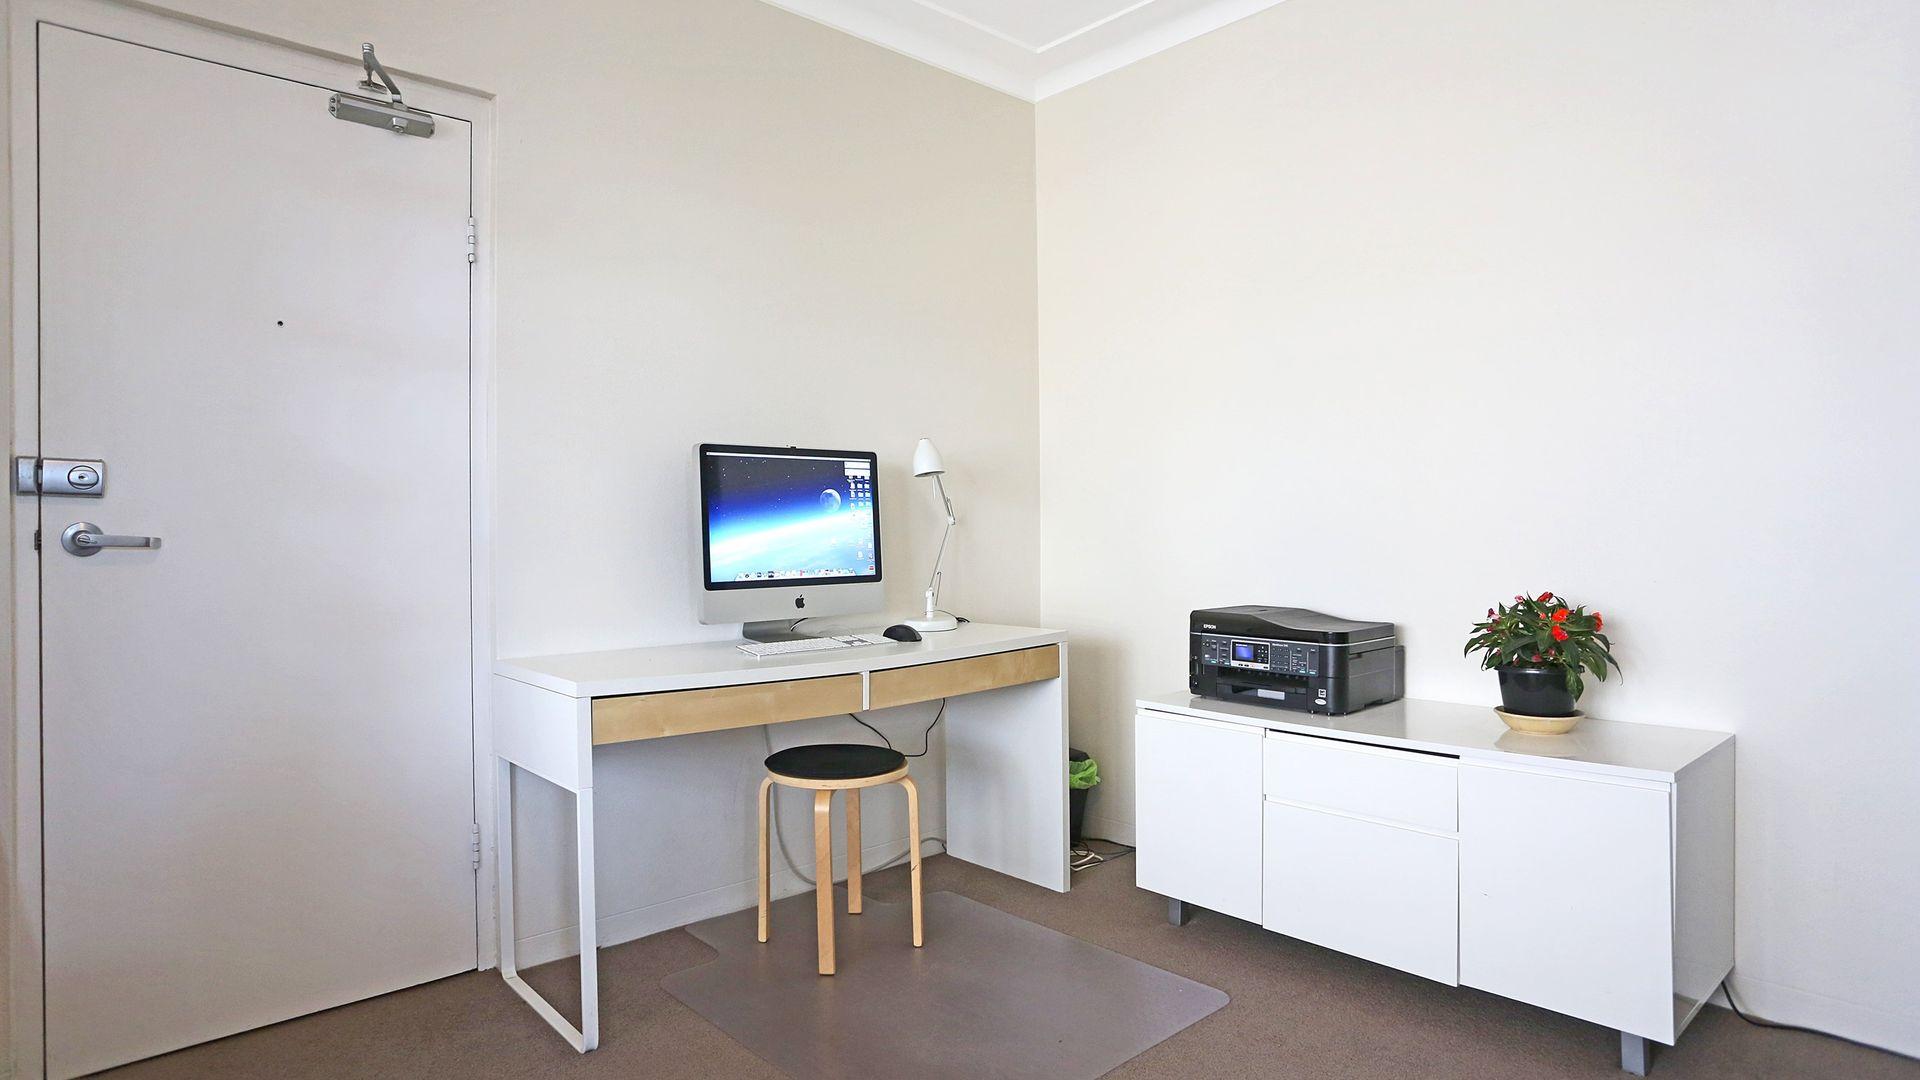 21/180 Raglan Street, Mosman NSW 2088, Image 1